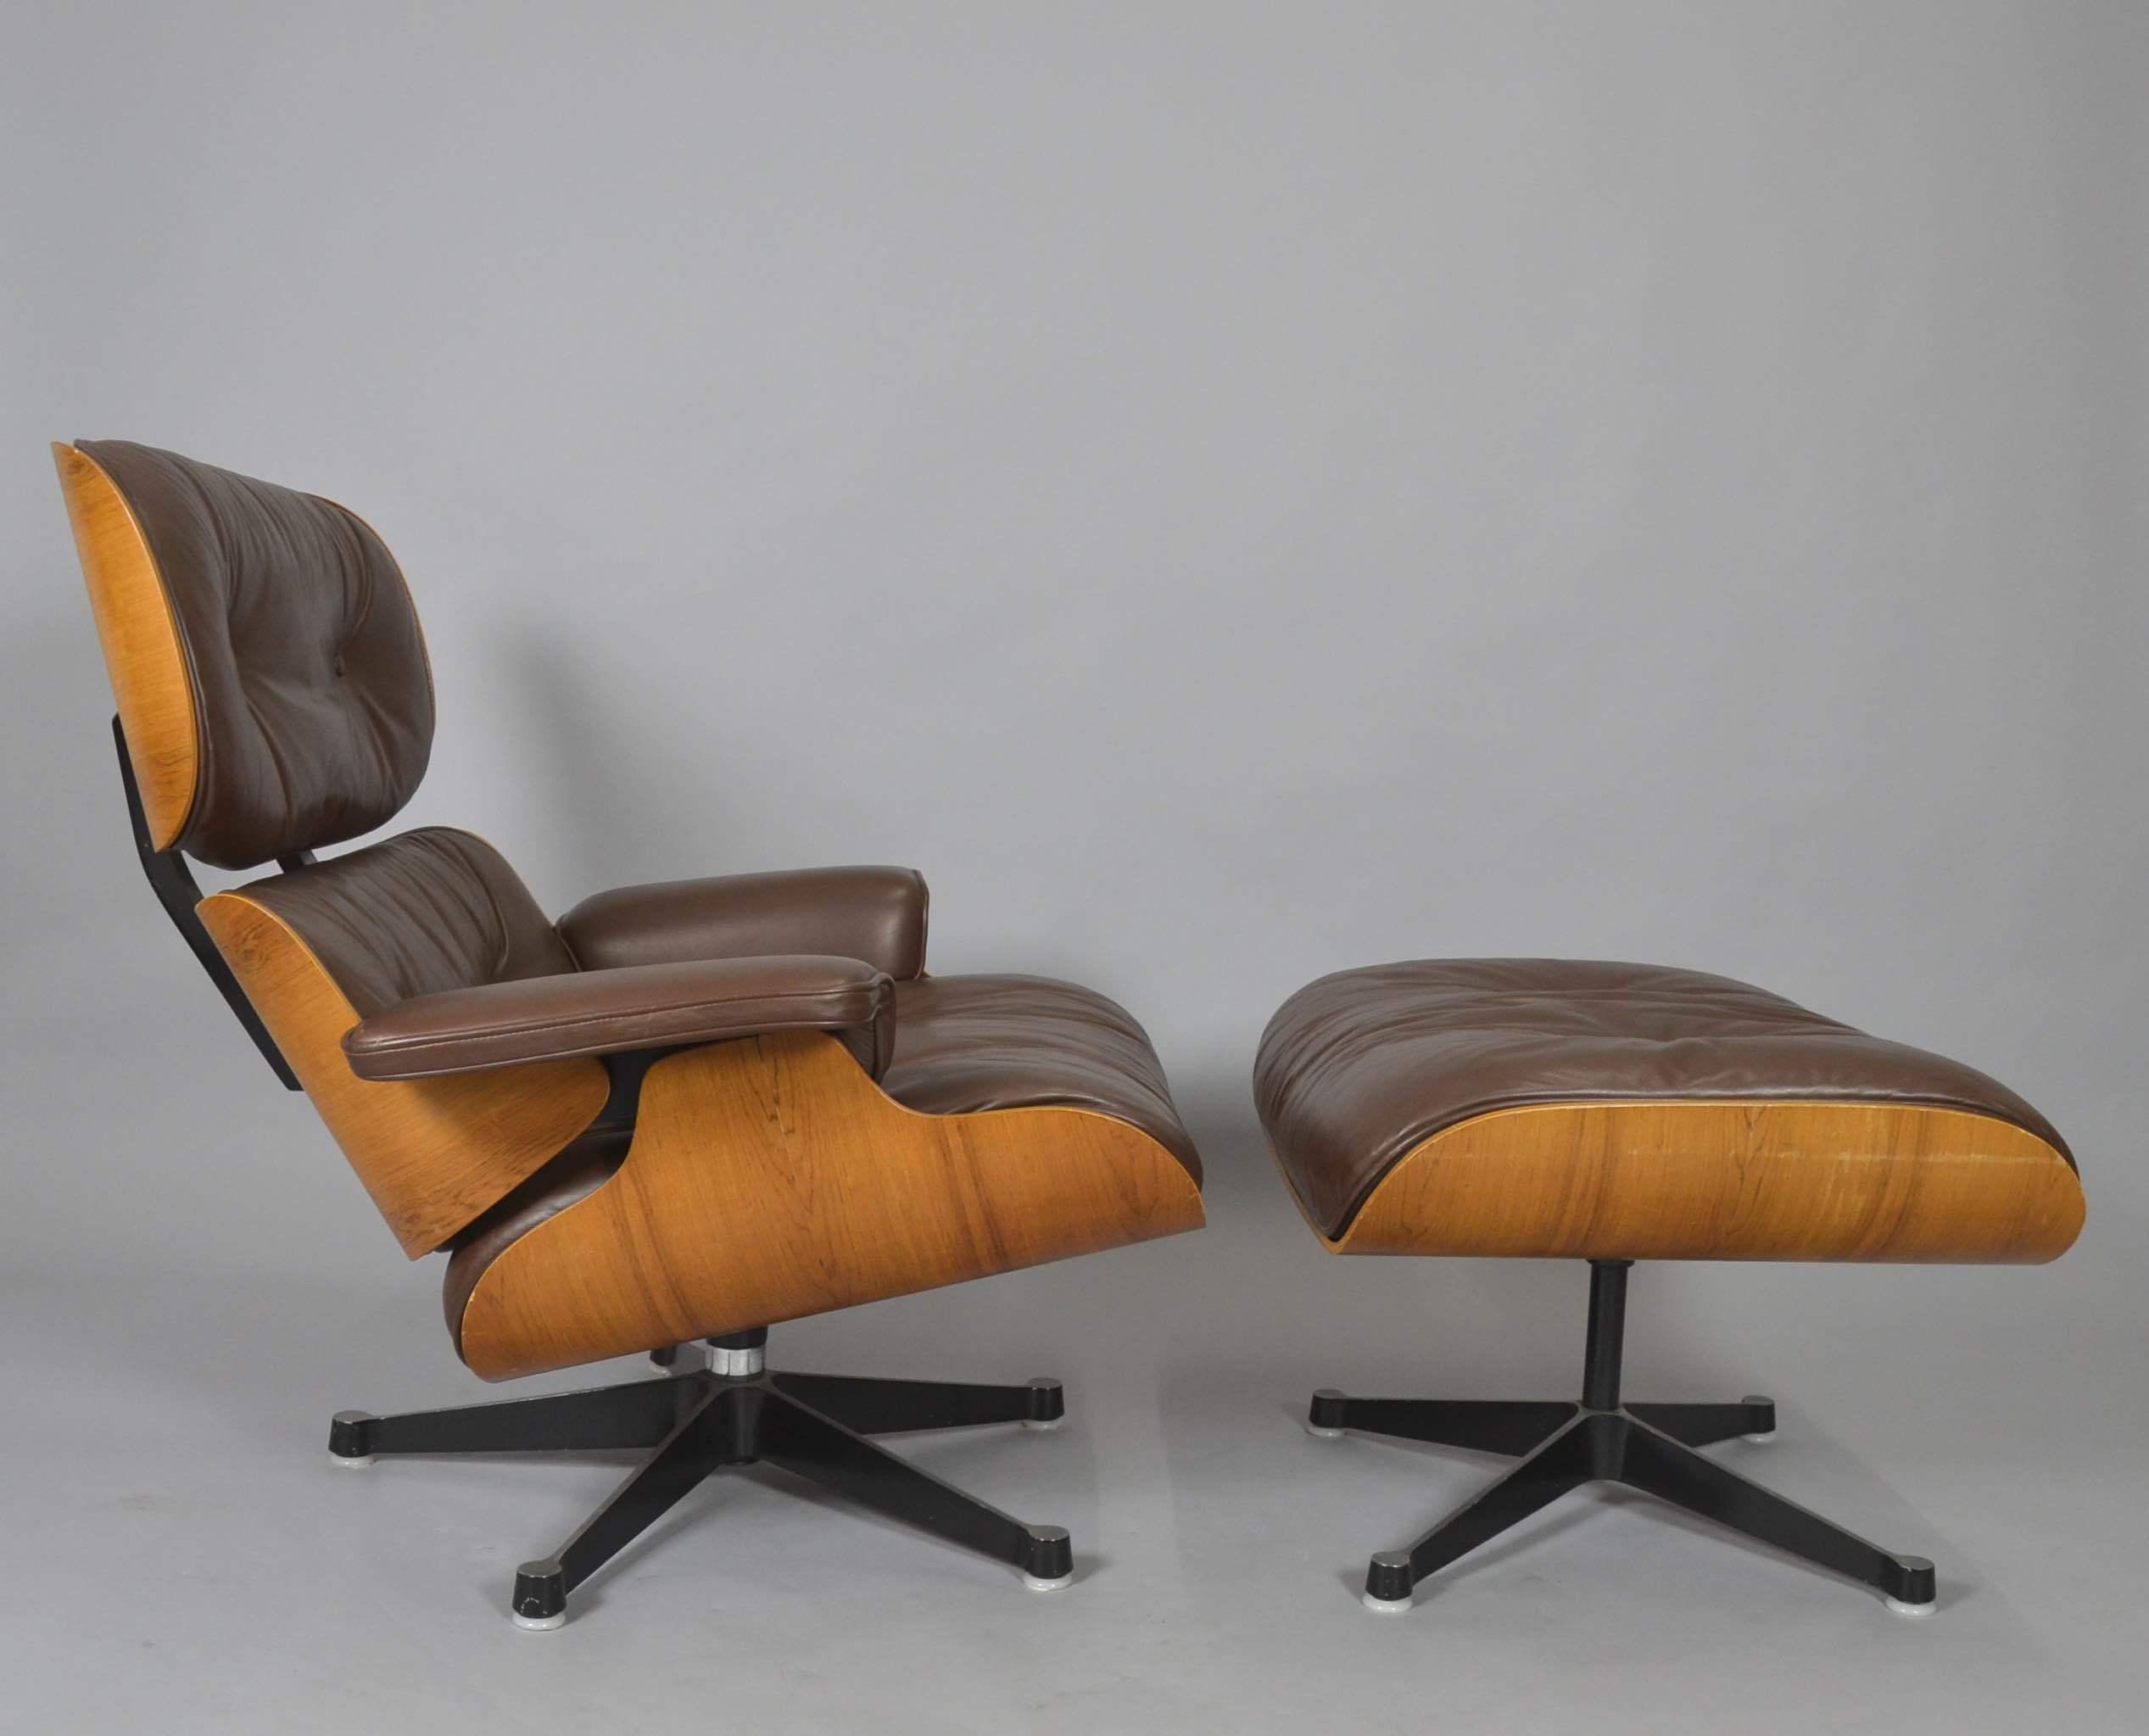 CHARLES EAMES. LOUNGE CHAIR MIT OTTOMANE FÜR VITRA. Furniture   Armchairs U0026  Chairs   Auctionet